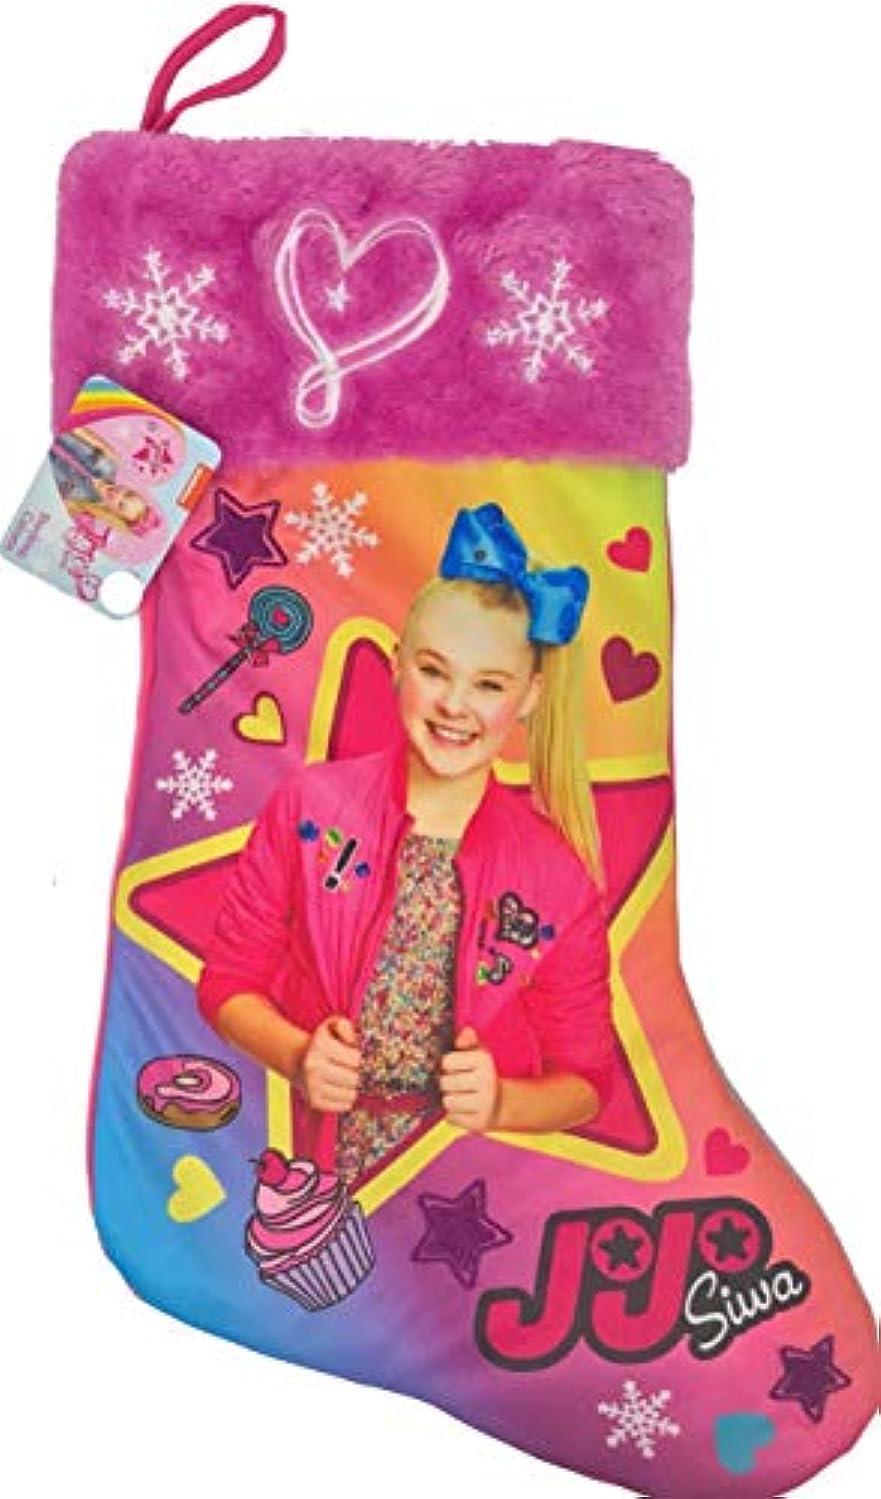 New JoJo Siwa Plush Children's Christmas Stocking/Hang & Fill Stocking with Gifts 2019